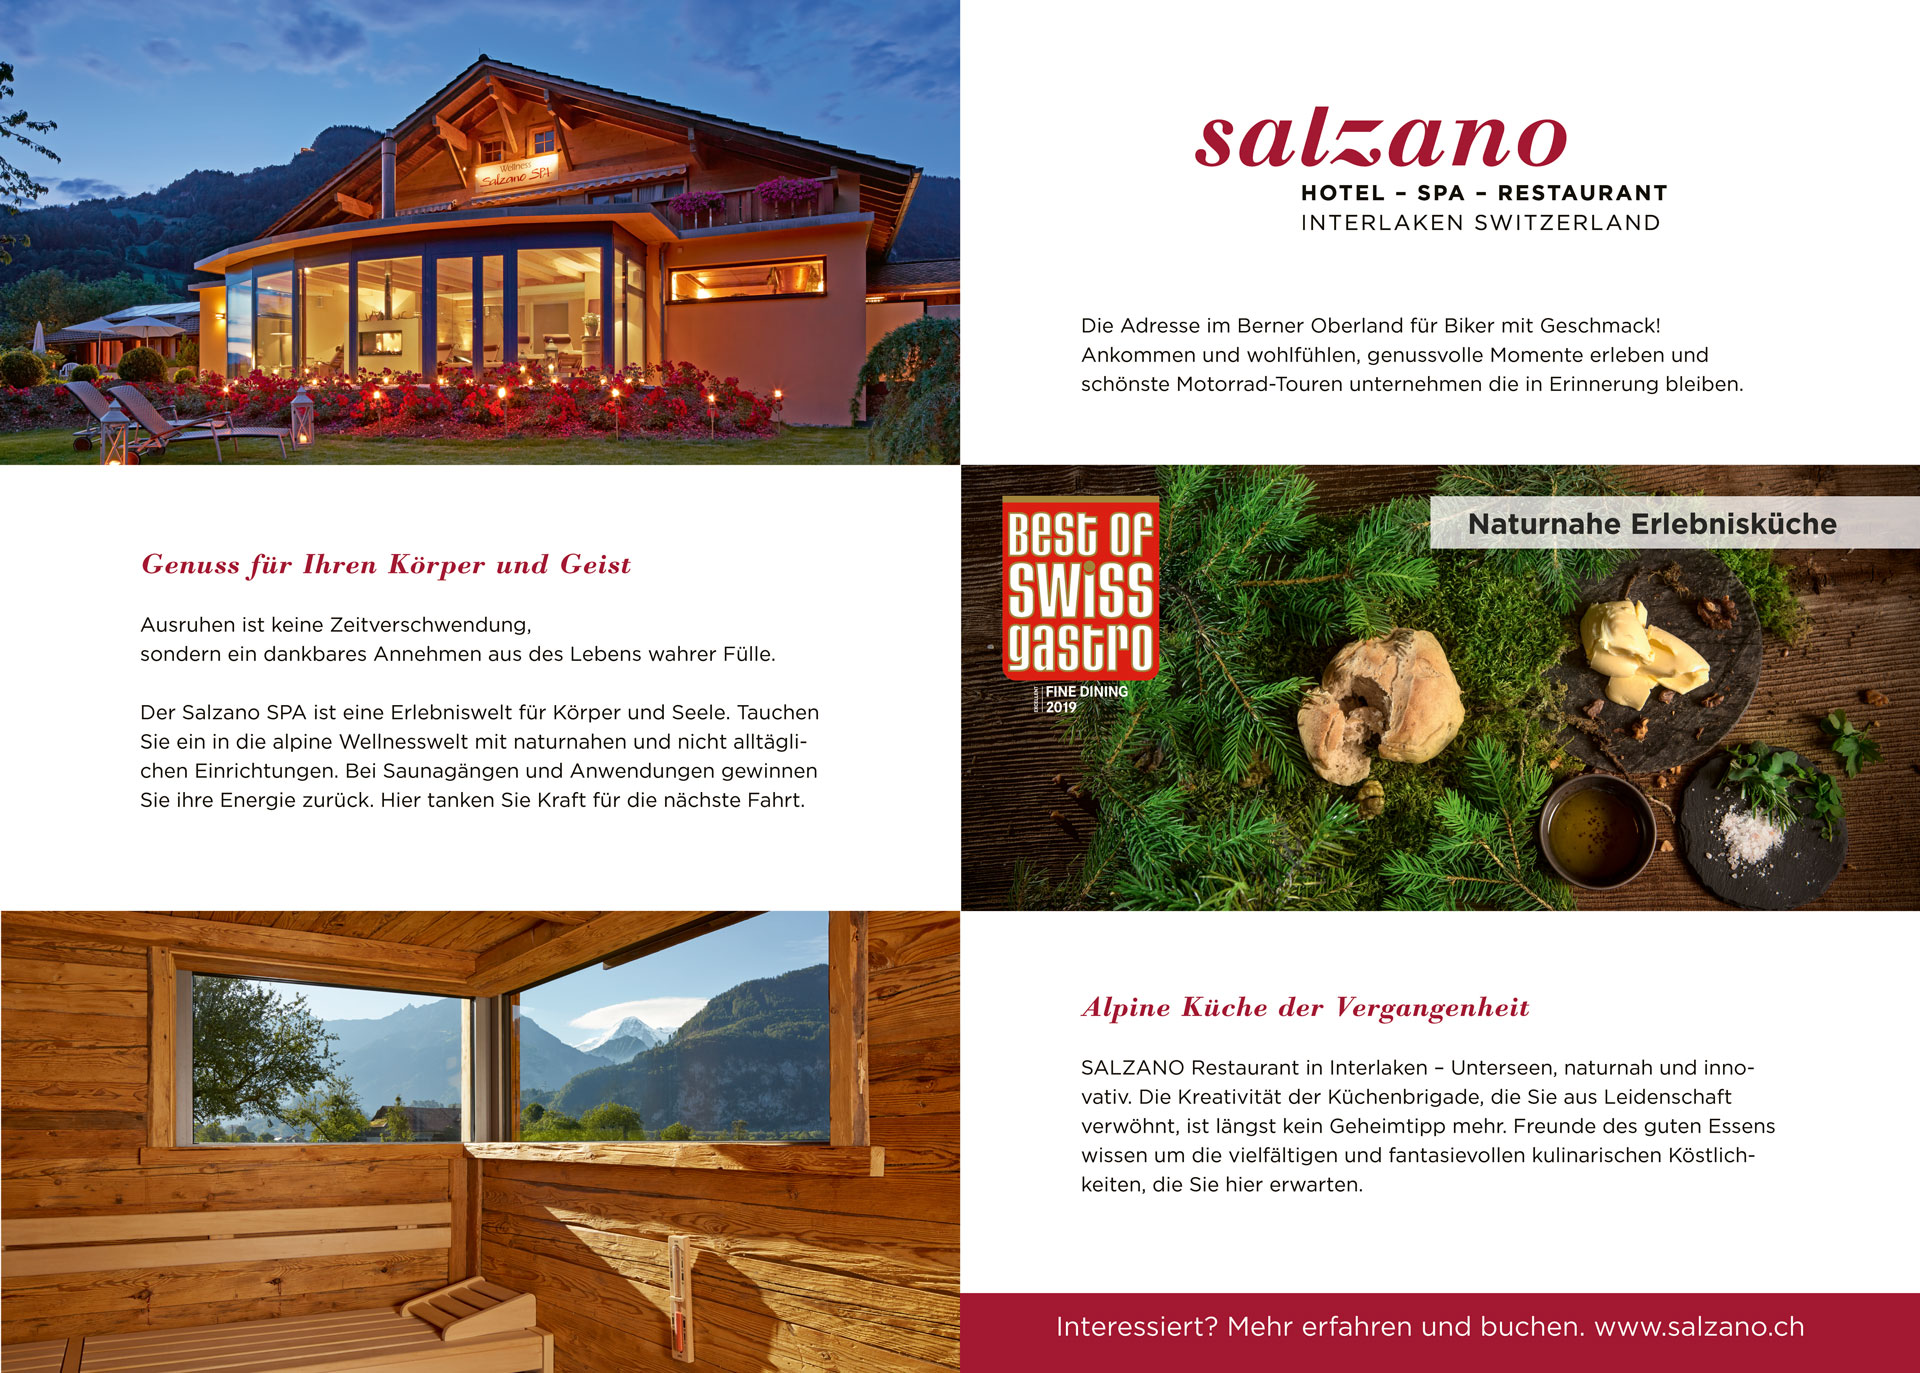 salzano_swissmoto_flyer_2019_Seite_2